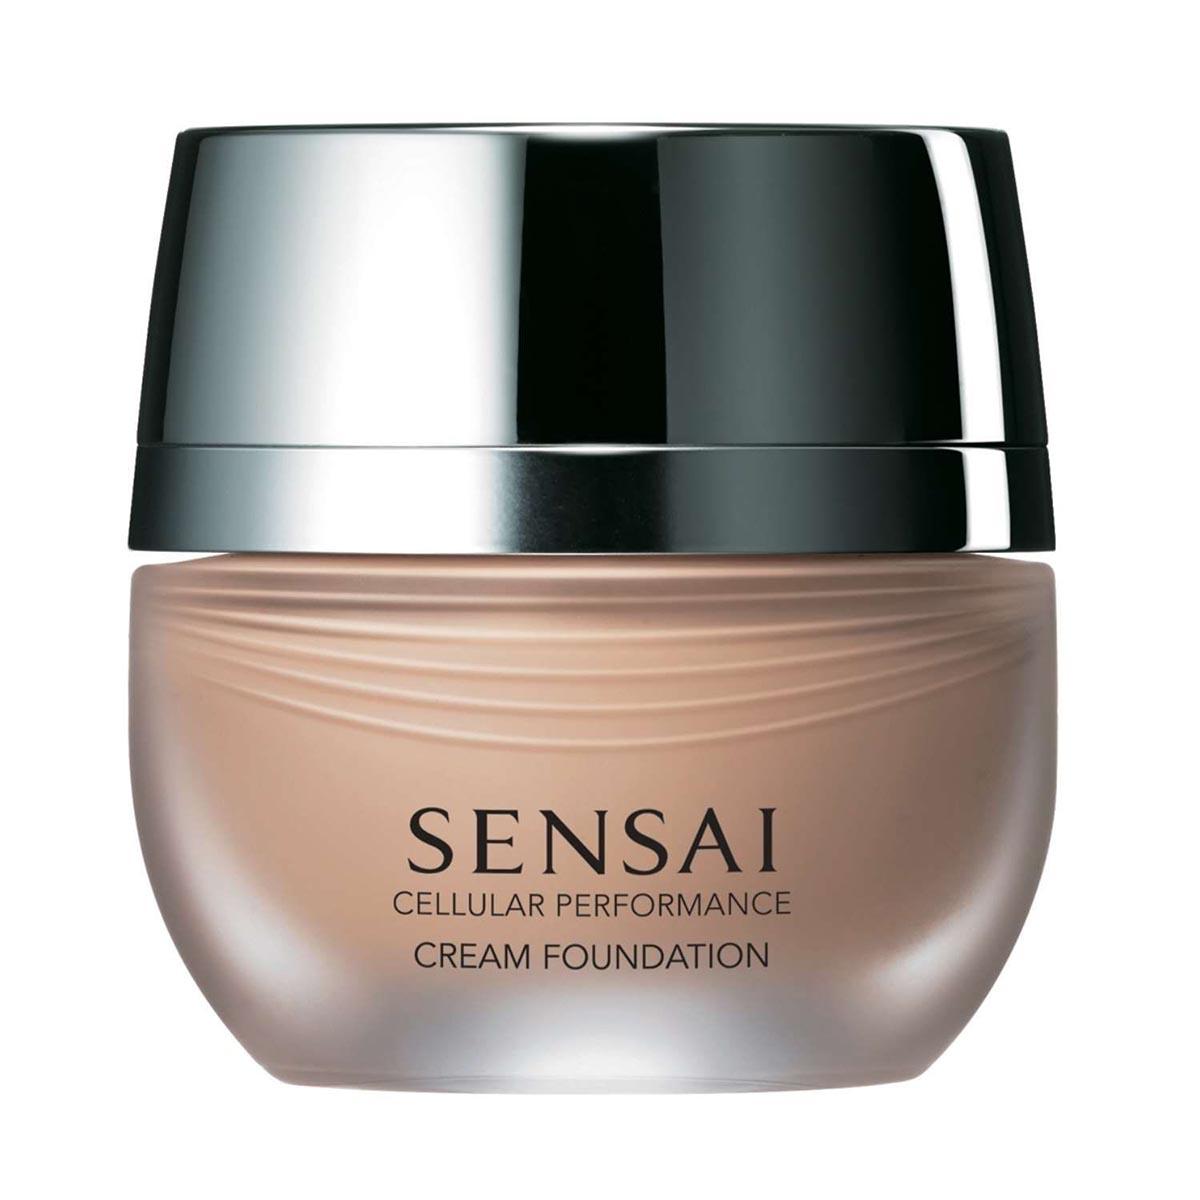 Kanebo sensai cellular performance cream foundation 24